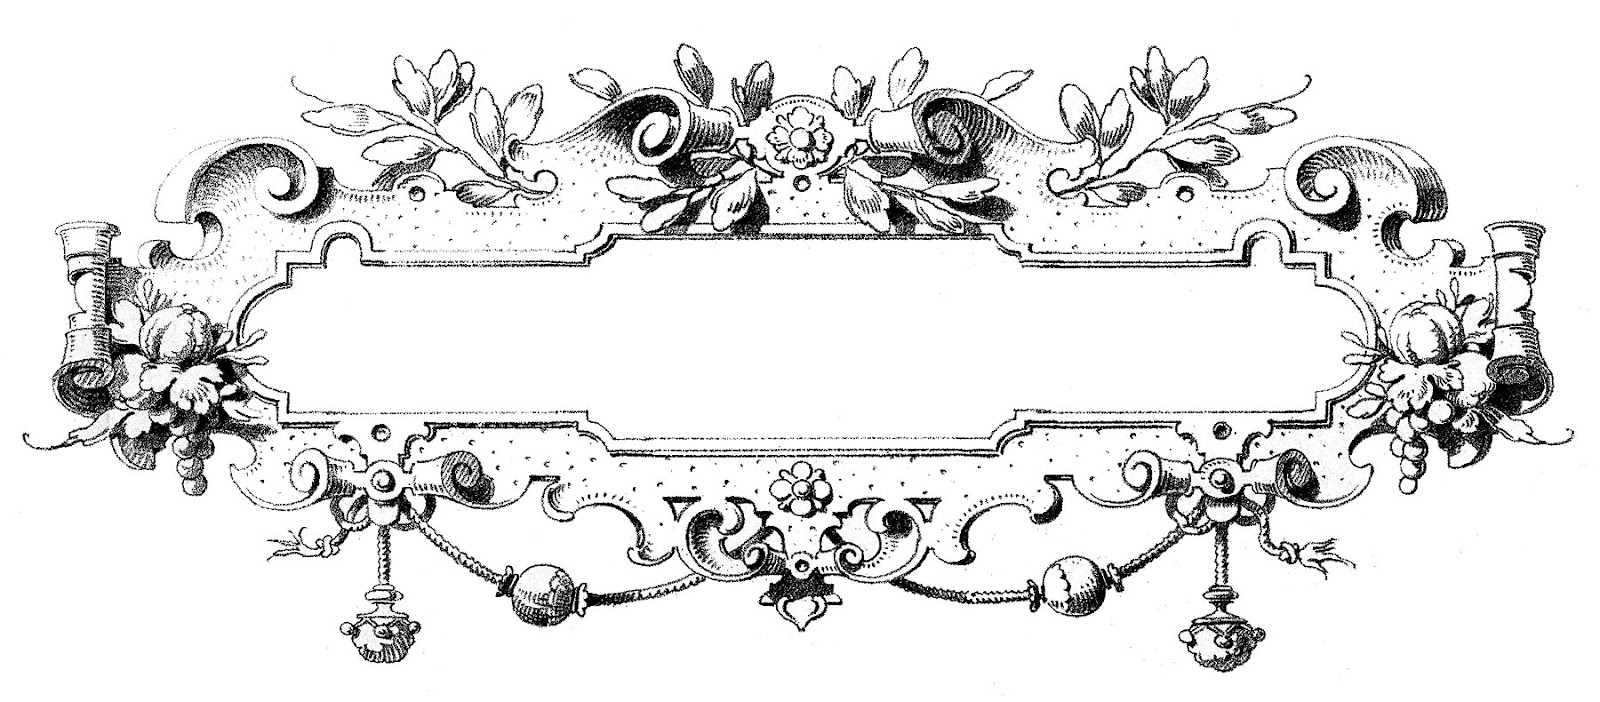 Vintage Clip Art - Gorgeous Ornate Frames - The Graphics Fairy